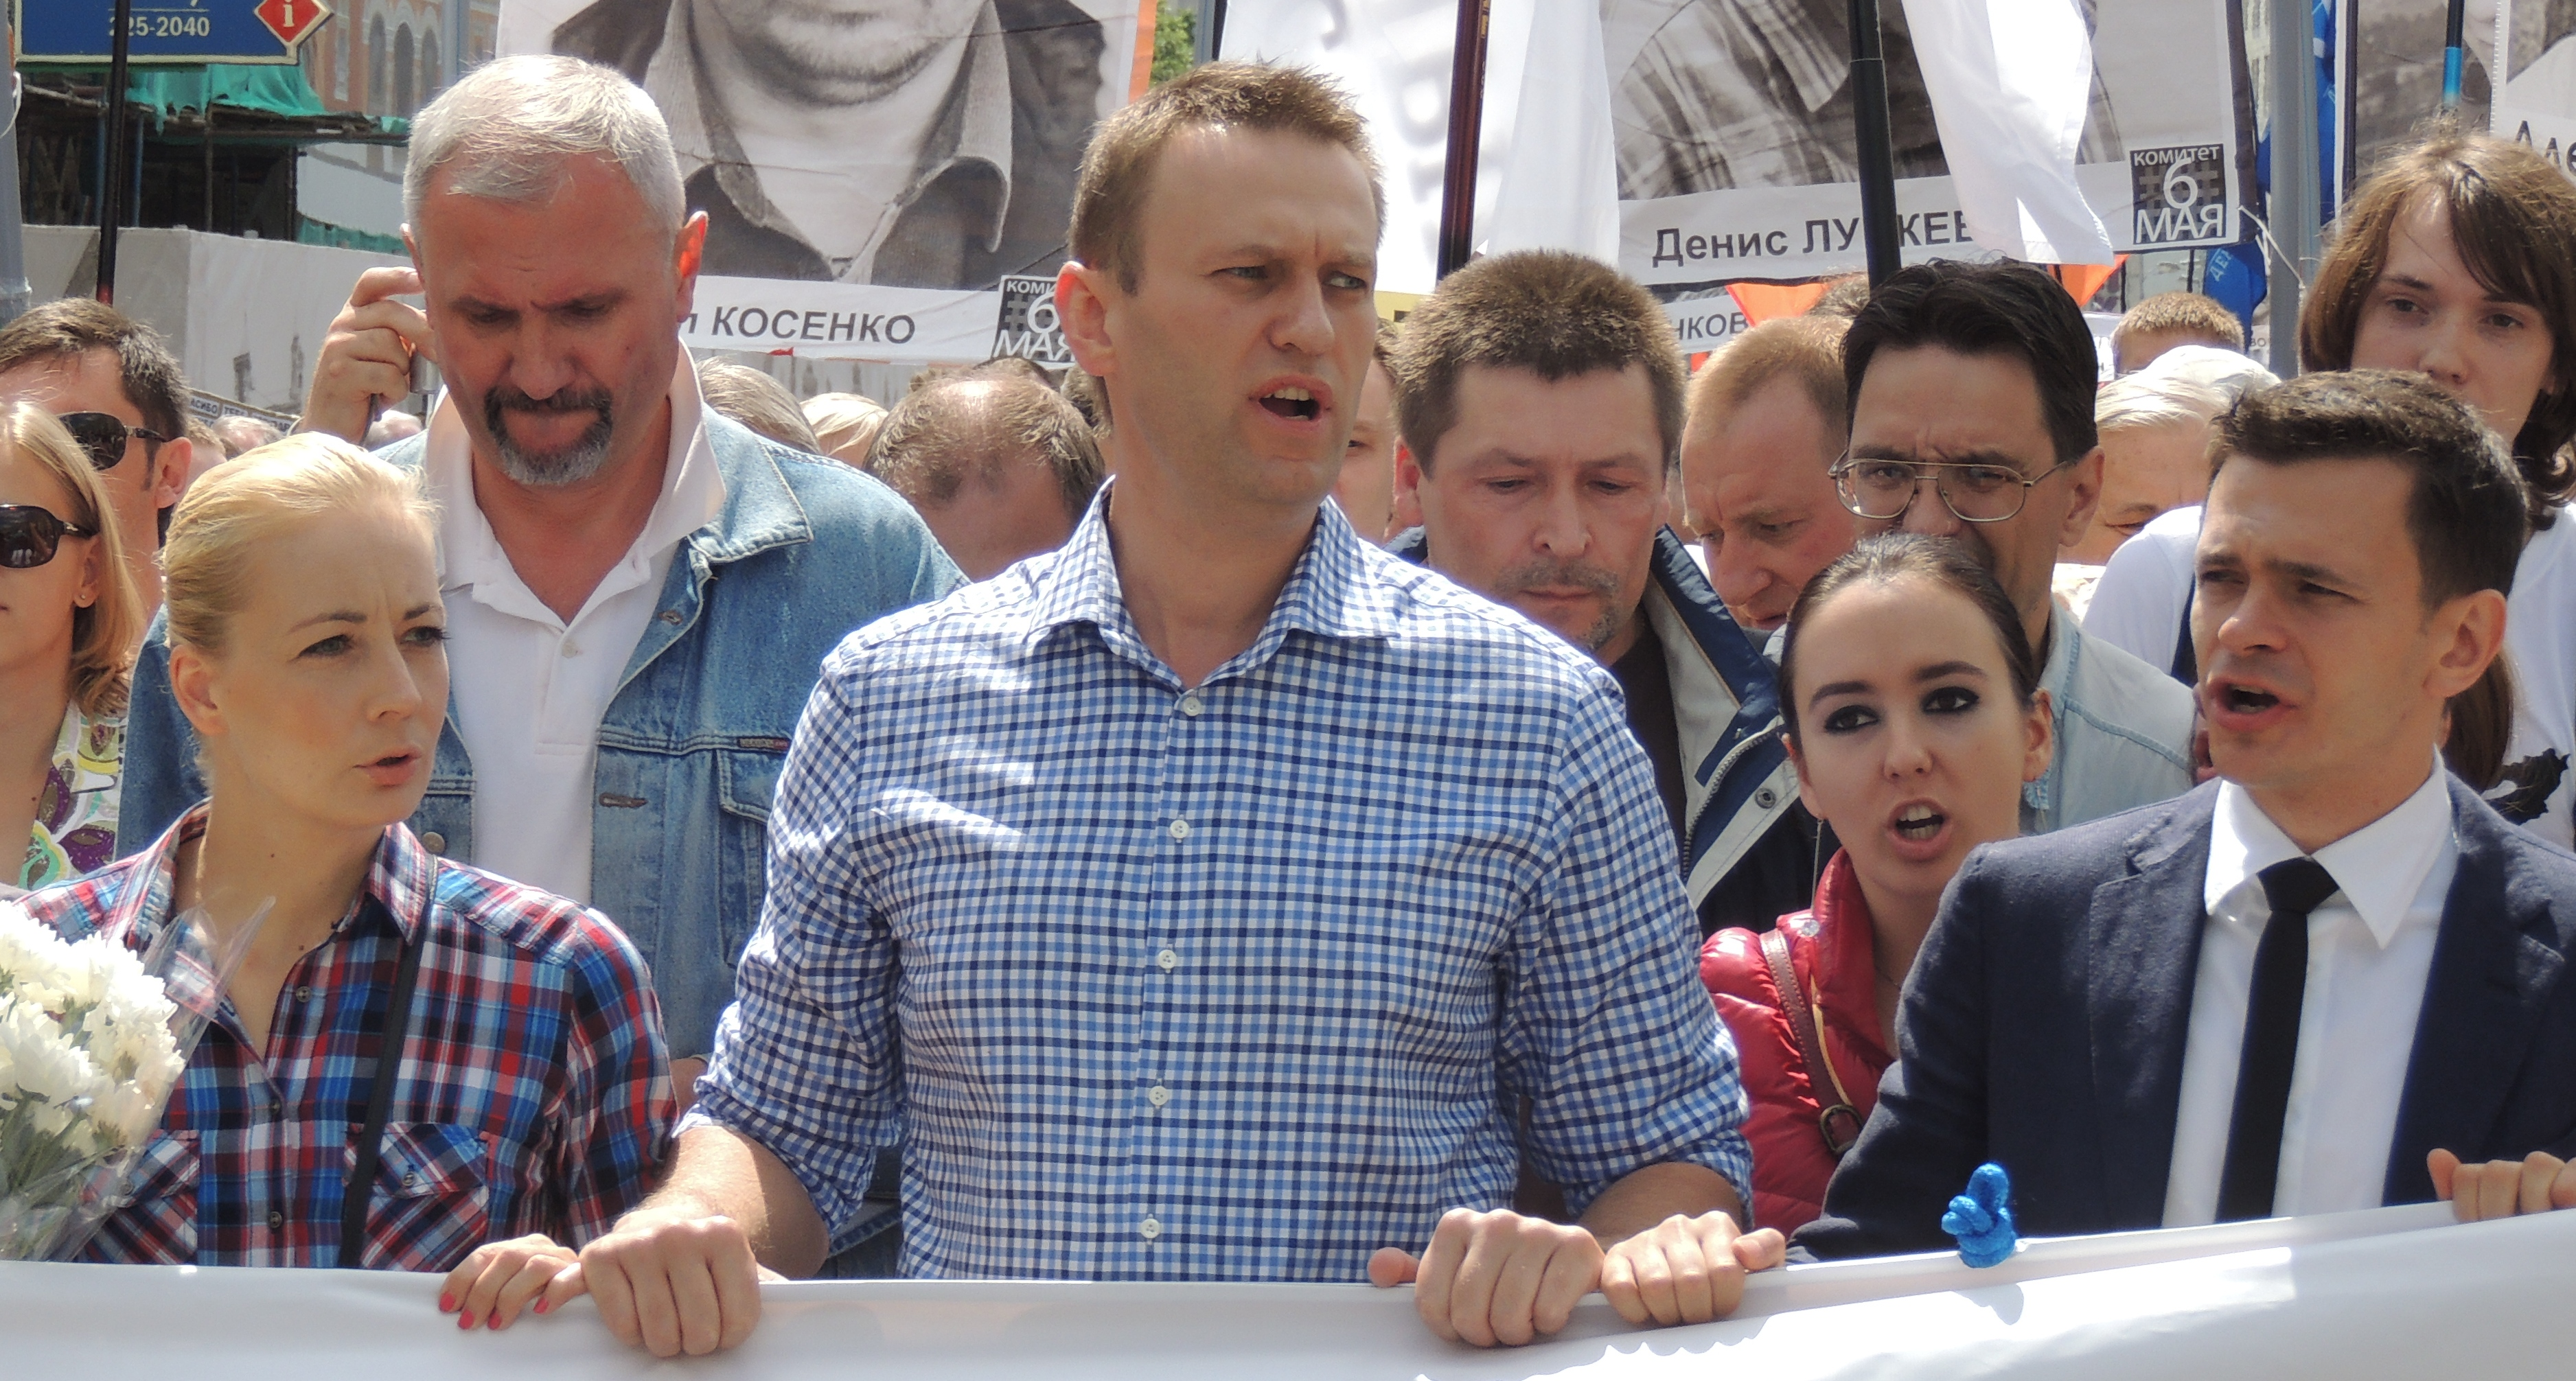 Explainer:  Why did Amnesty International rescind Alexey Navalny's 'prisoner of conscience' status?